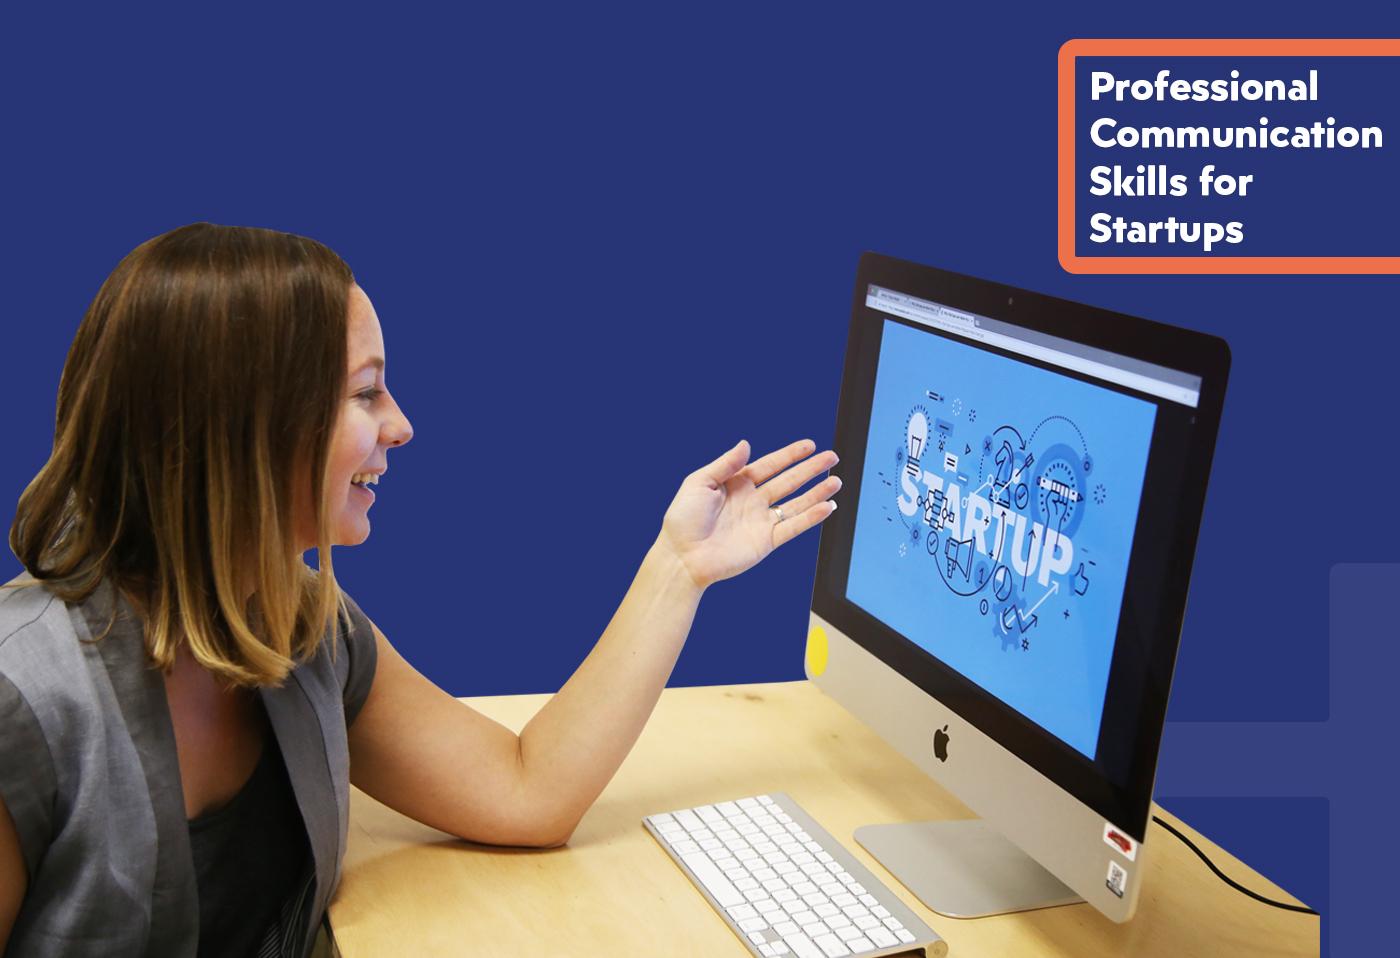 8 Professional Communication Skills for Startups.jpg